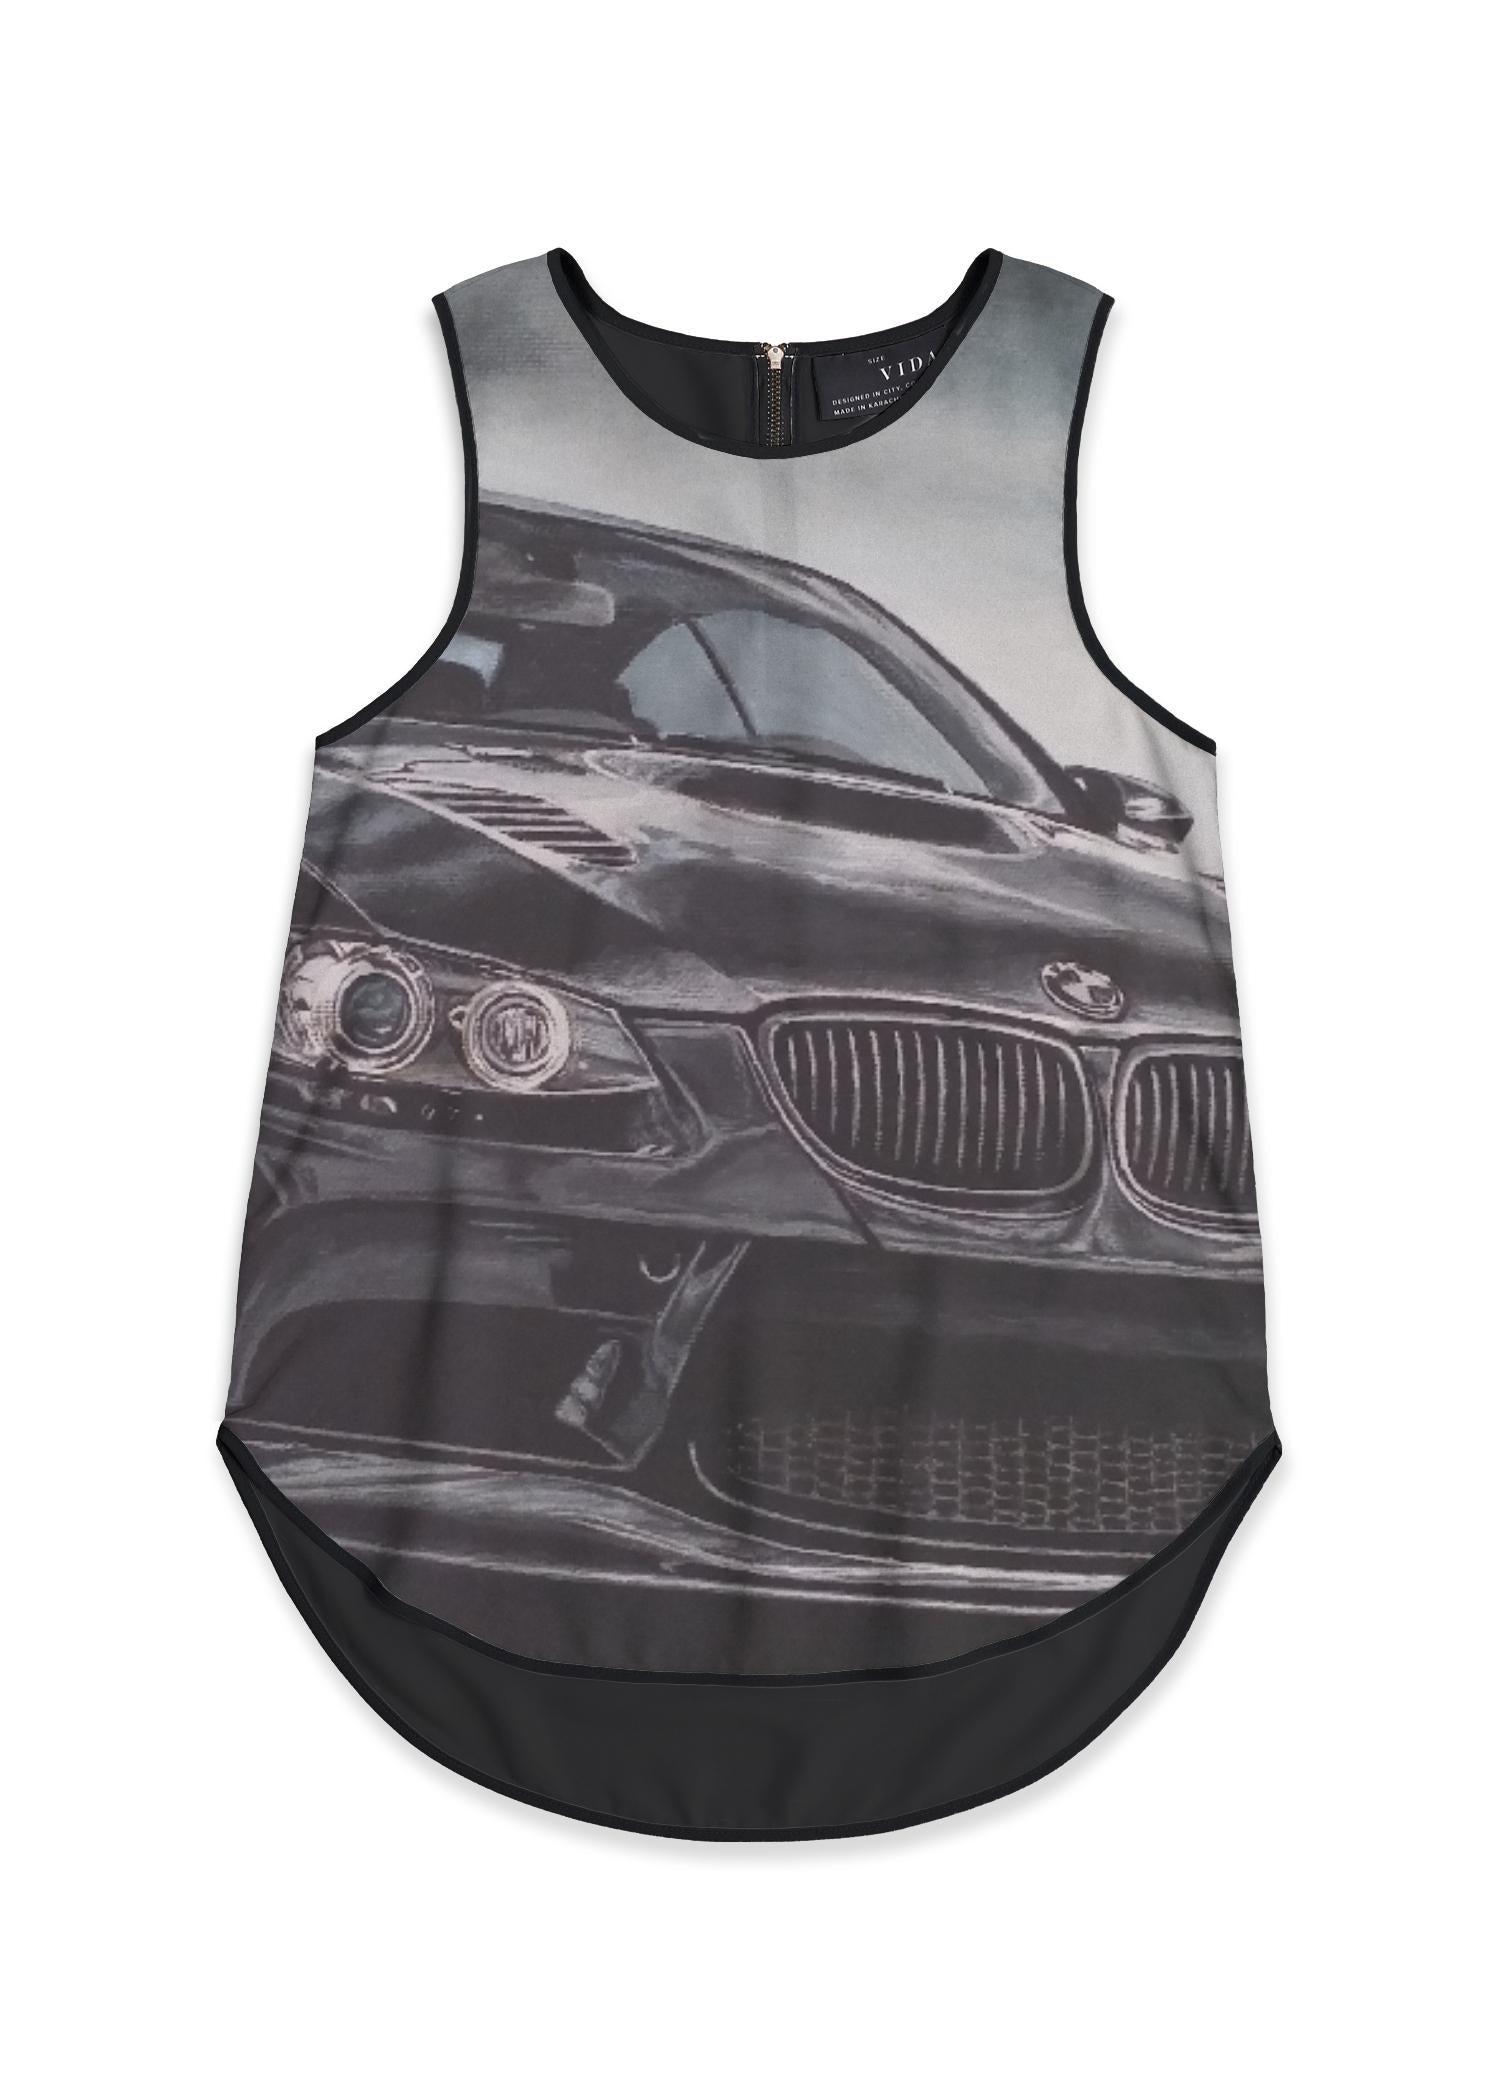 VIDA Sleeveless Top - Sport Car by VIDA Original Artist  - Size: Black / 2X